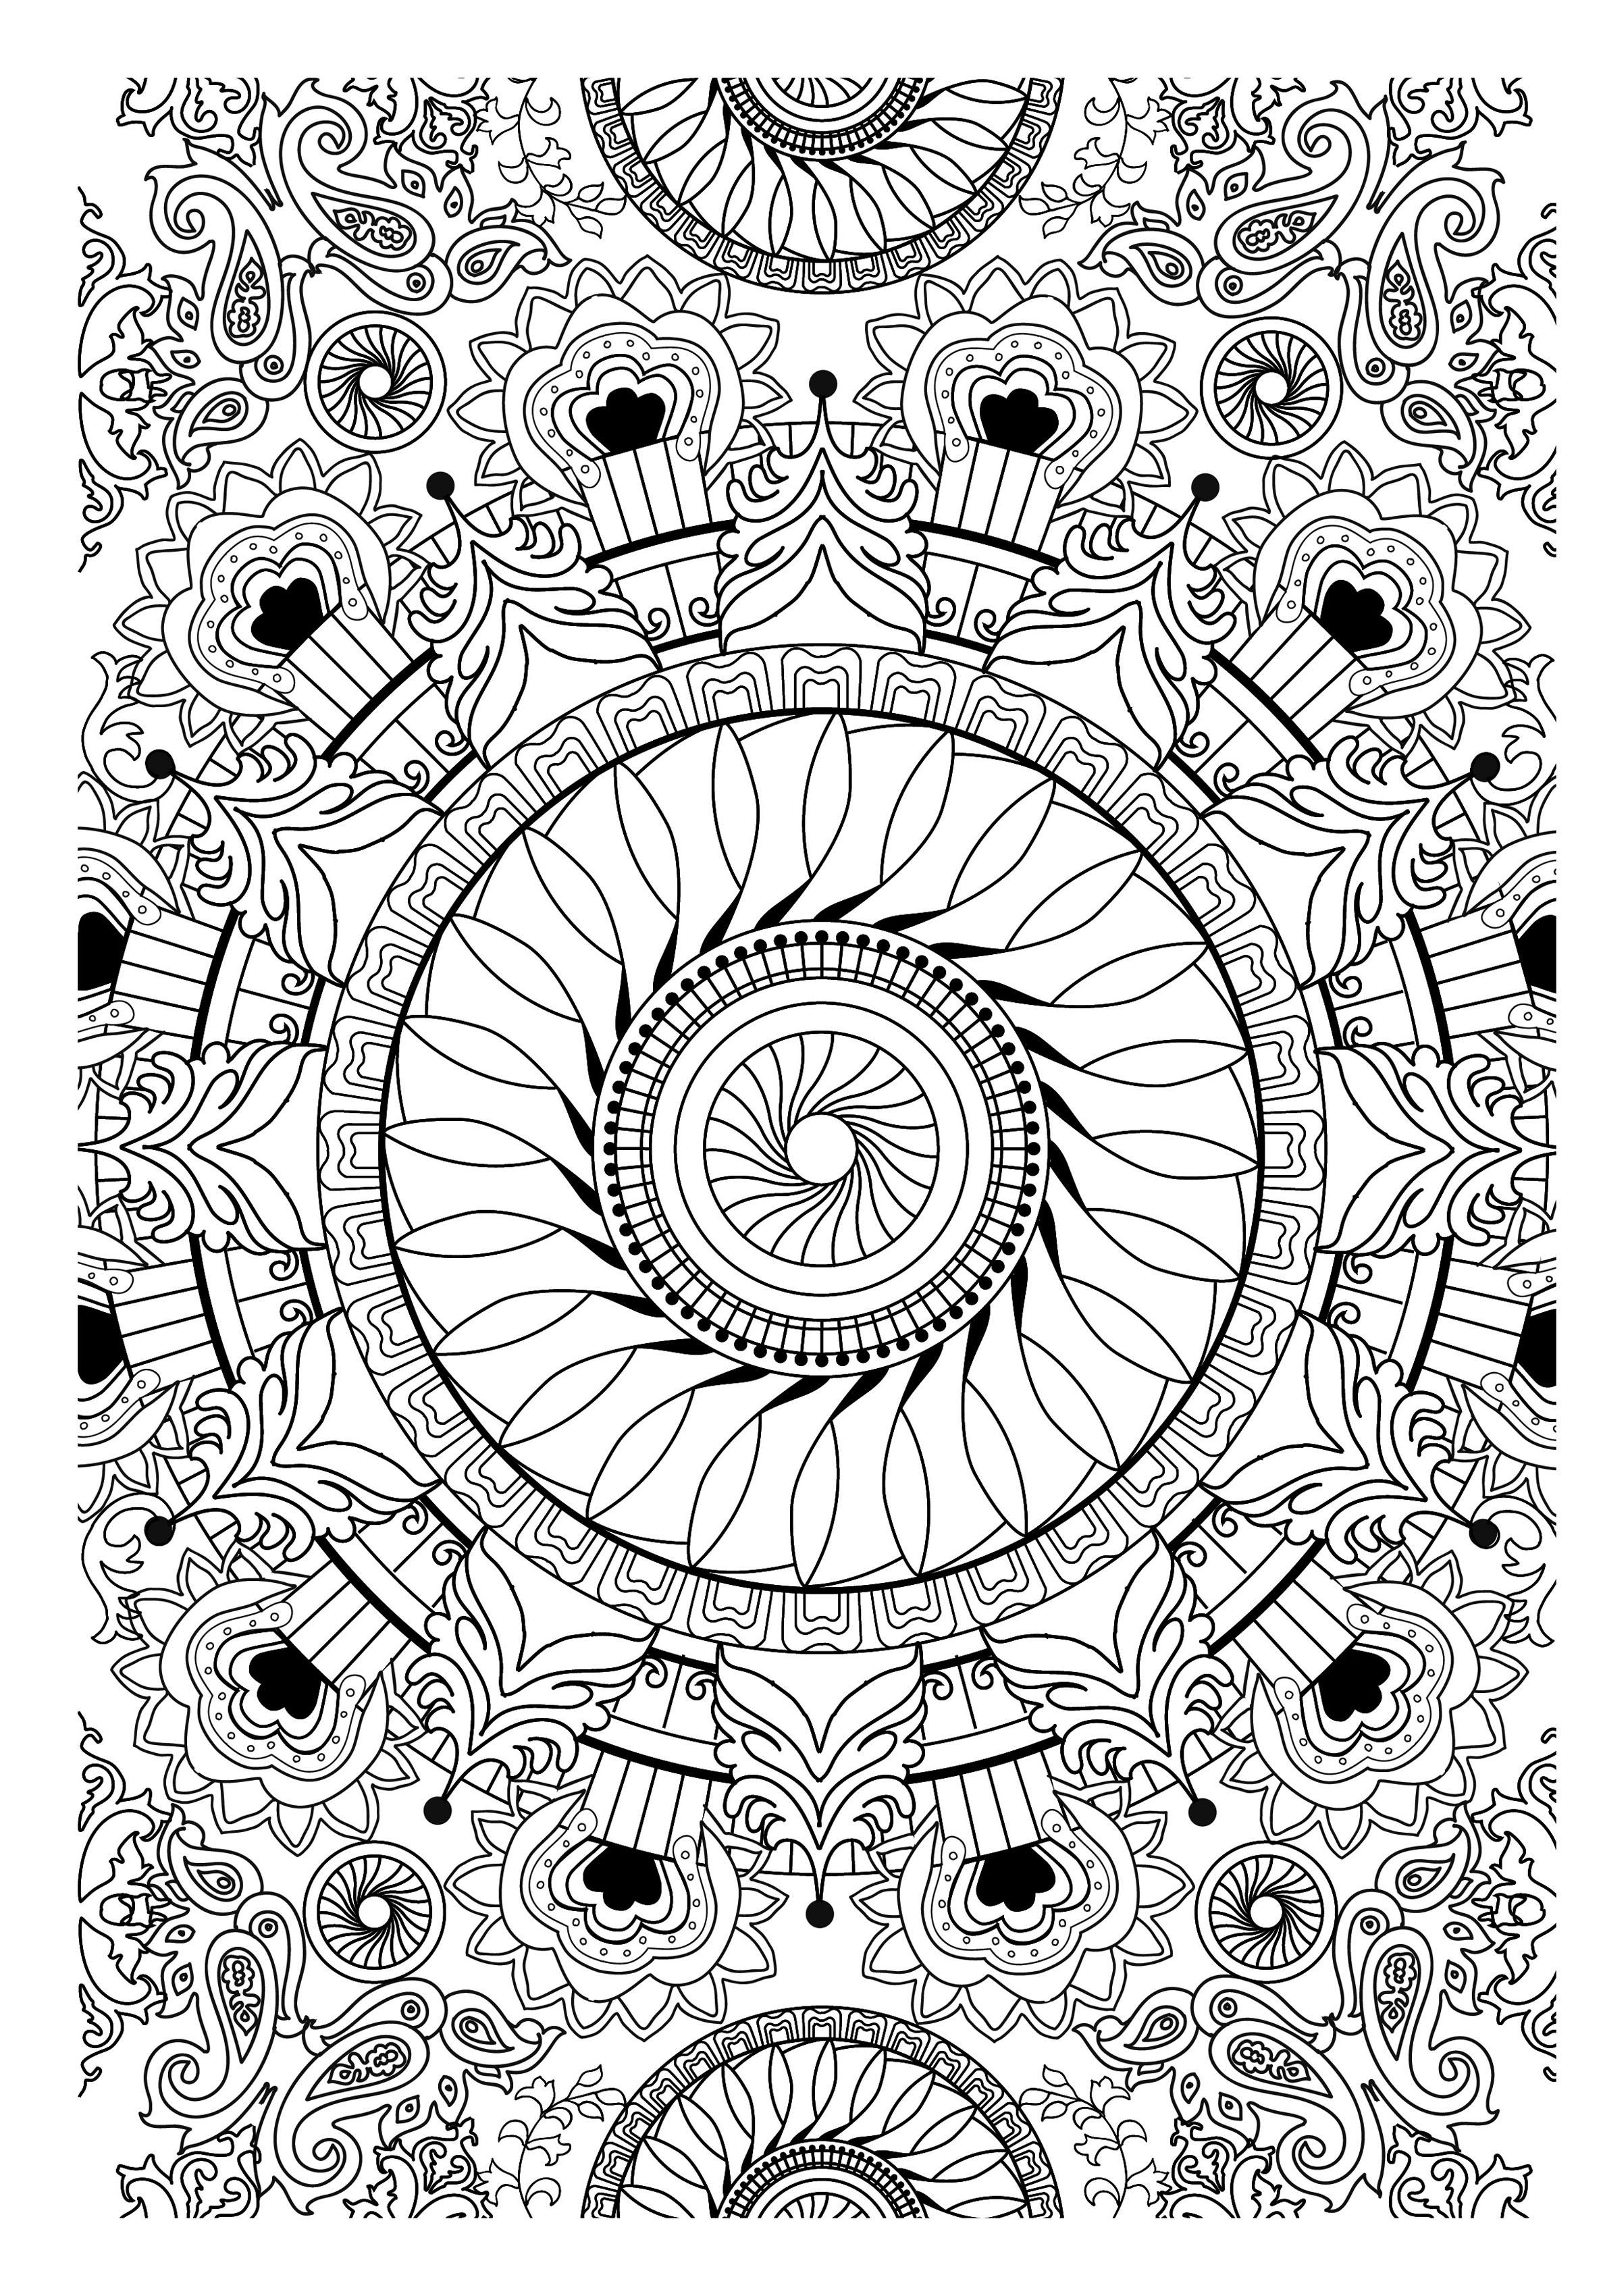 Colorear para adultos : Mandalas - 23